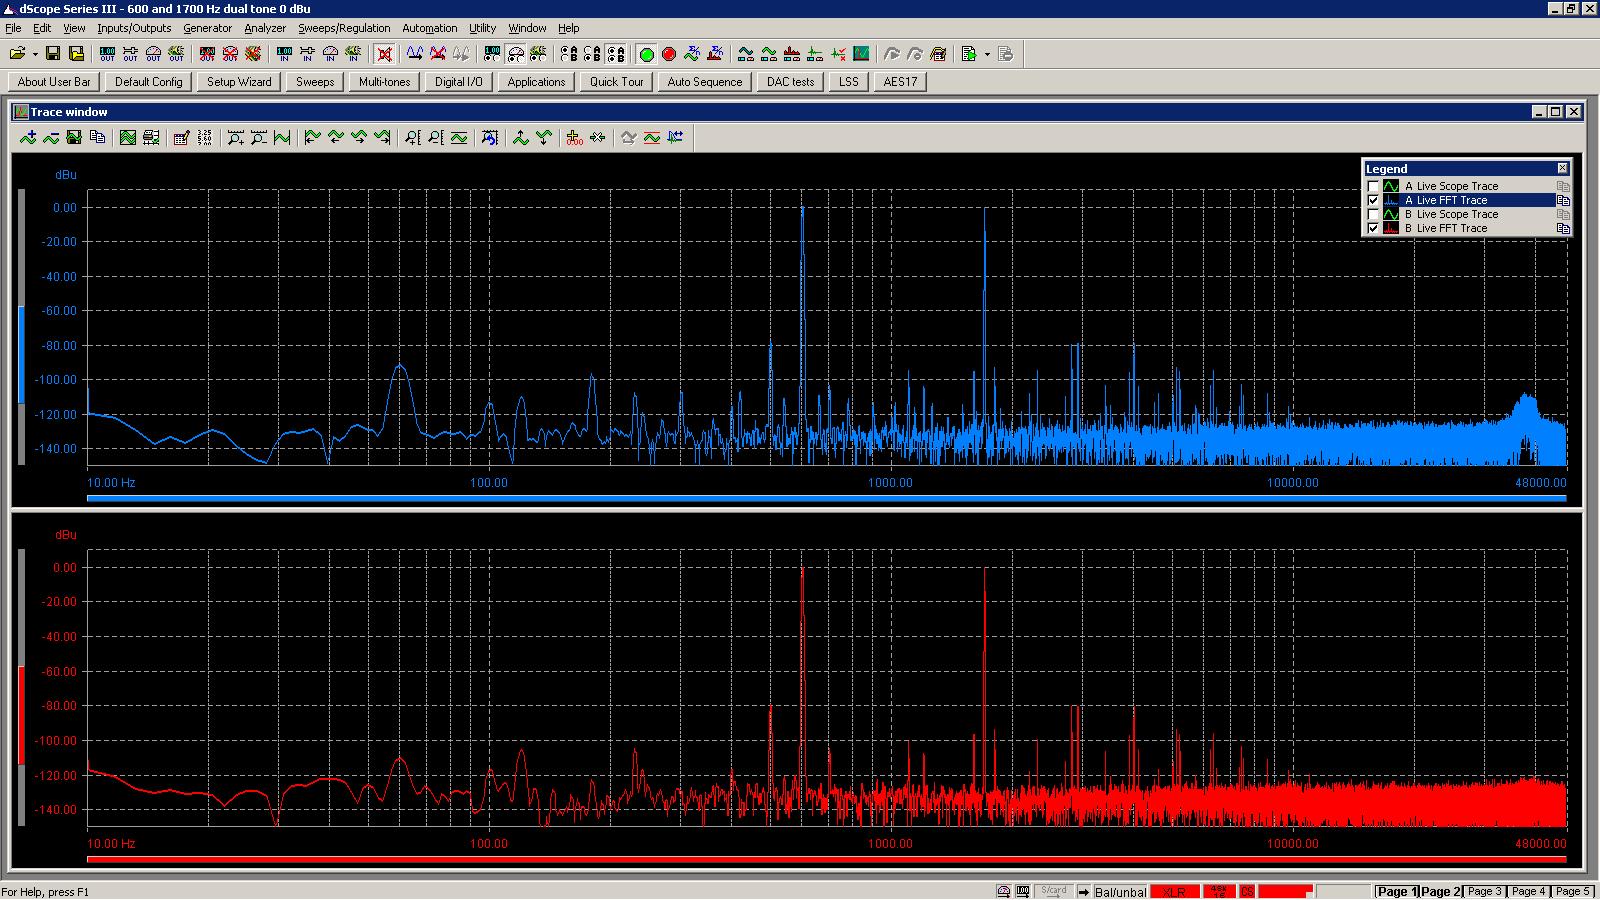 20151214 LiqCarb 600+1700Hz dual tone 0dBu 30R.png